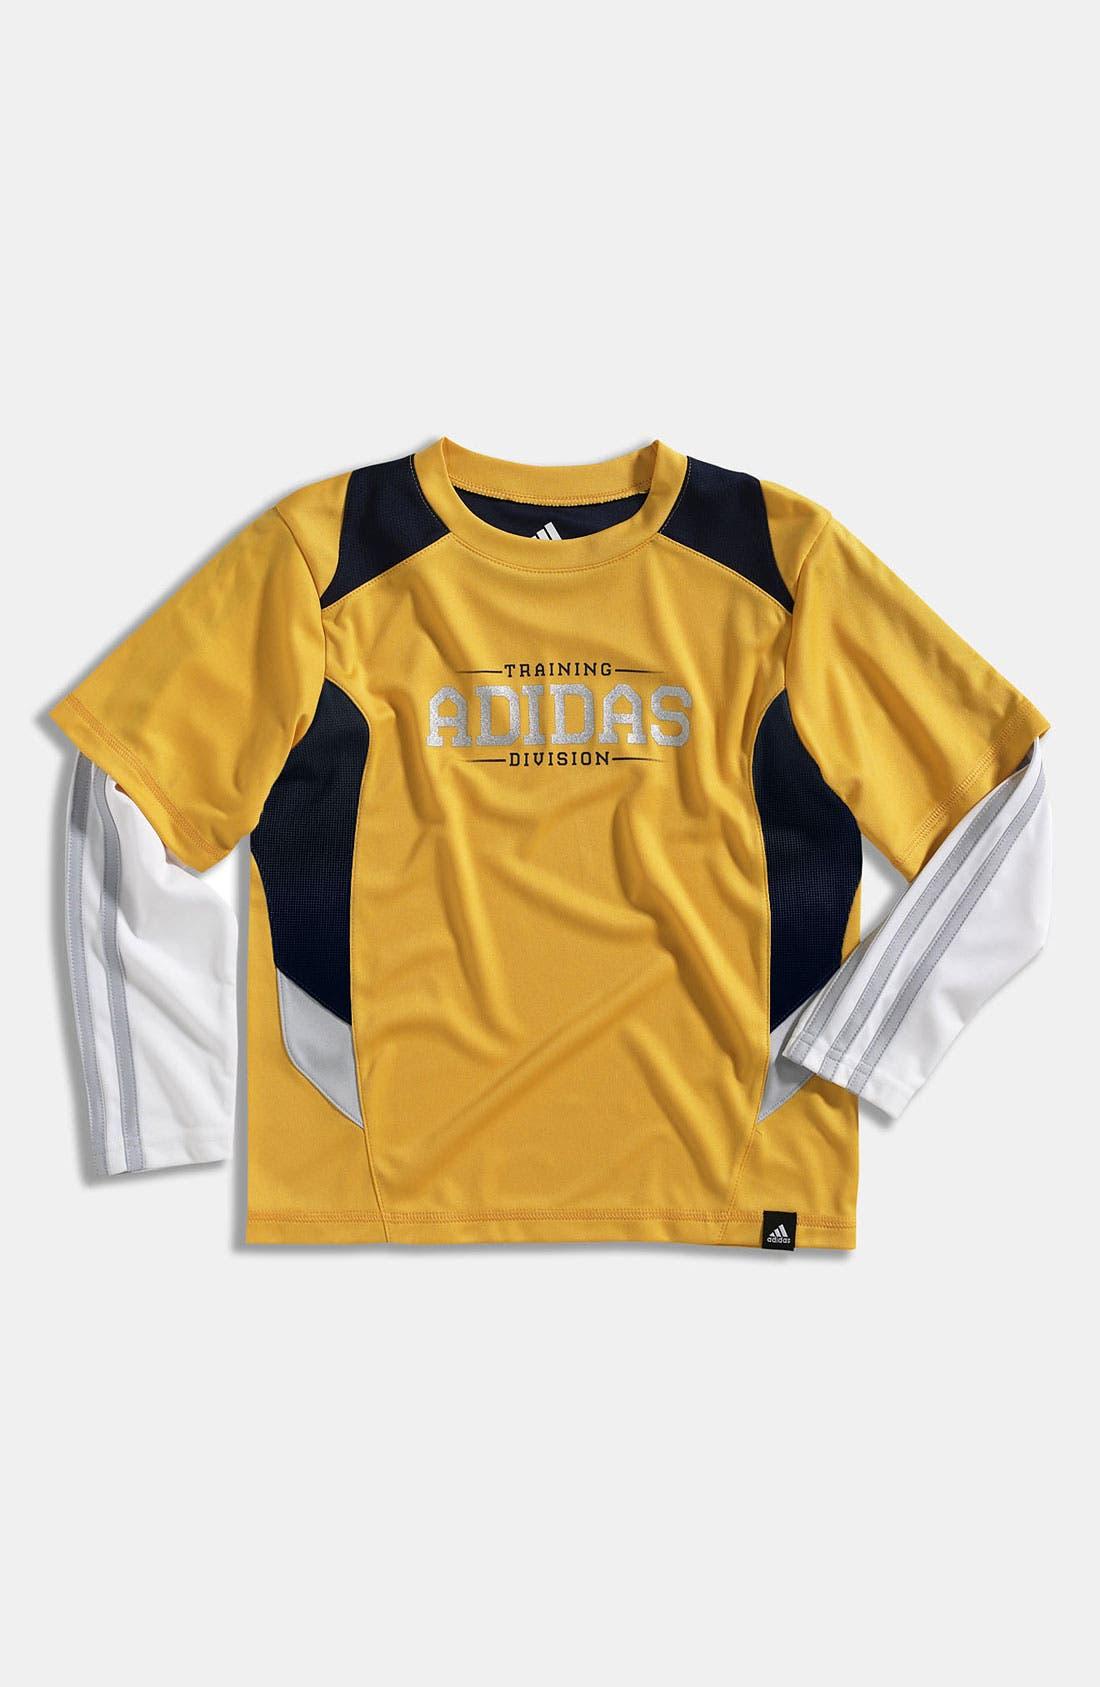 Alternate Image 1 Selected - adidas 'Tech Trainer' T-Shirt (Little Boys)